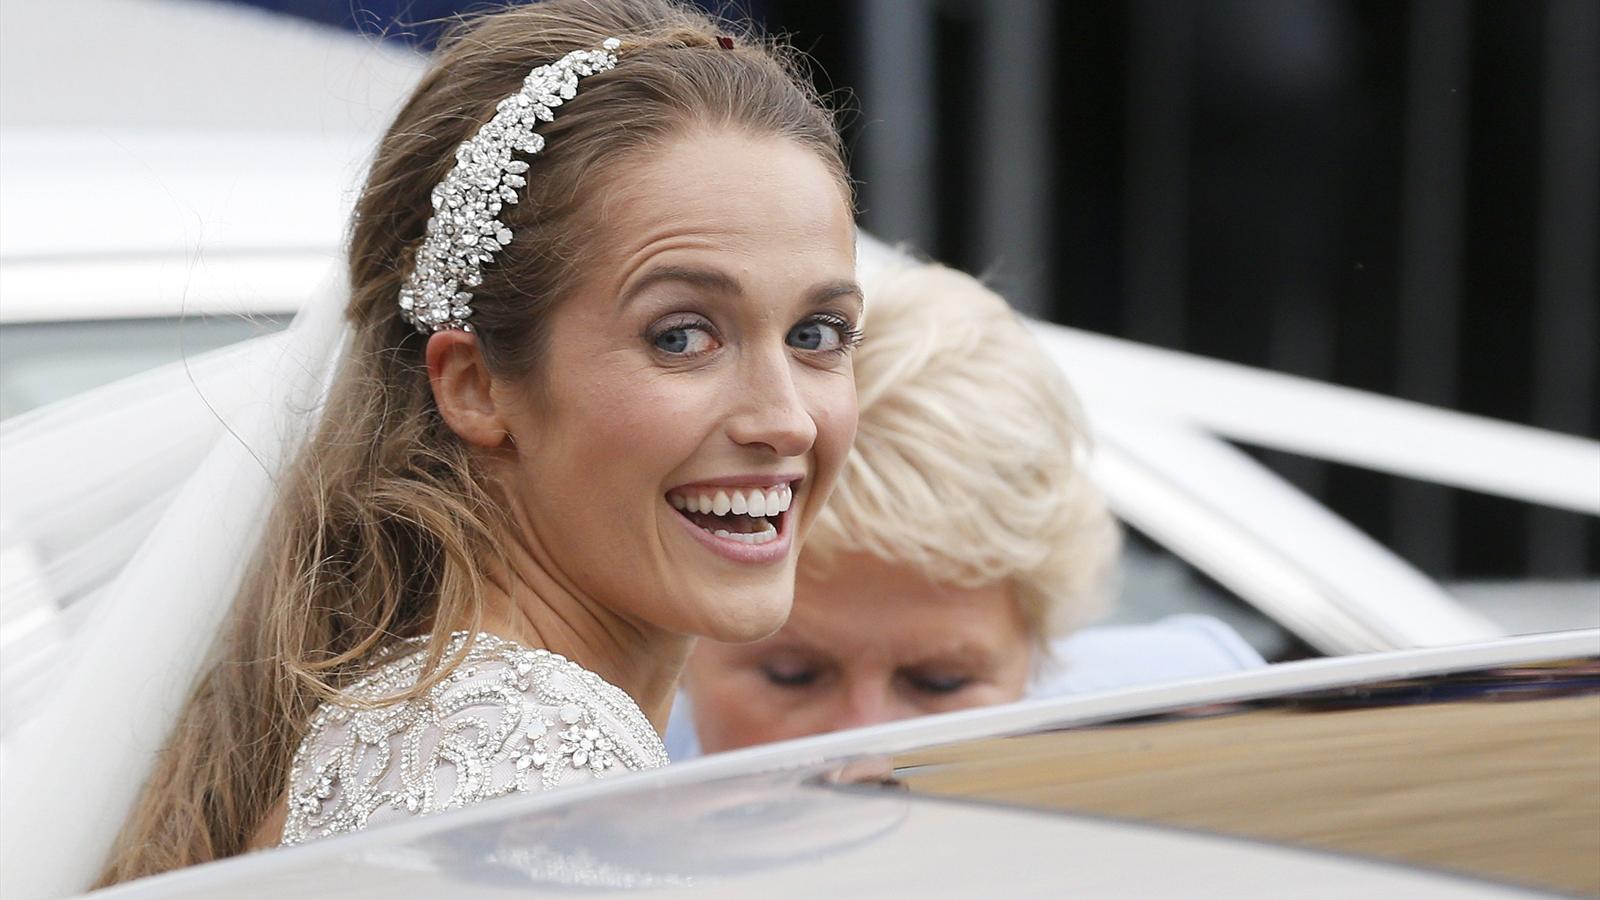 Andy murray dons kilt as he marries kim sears tennis eurosport